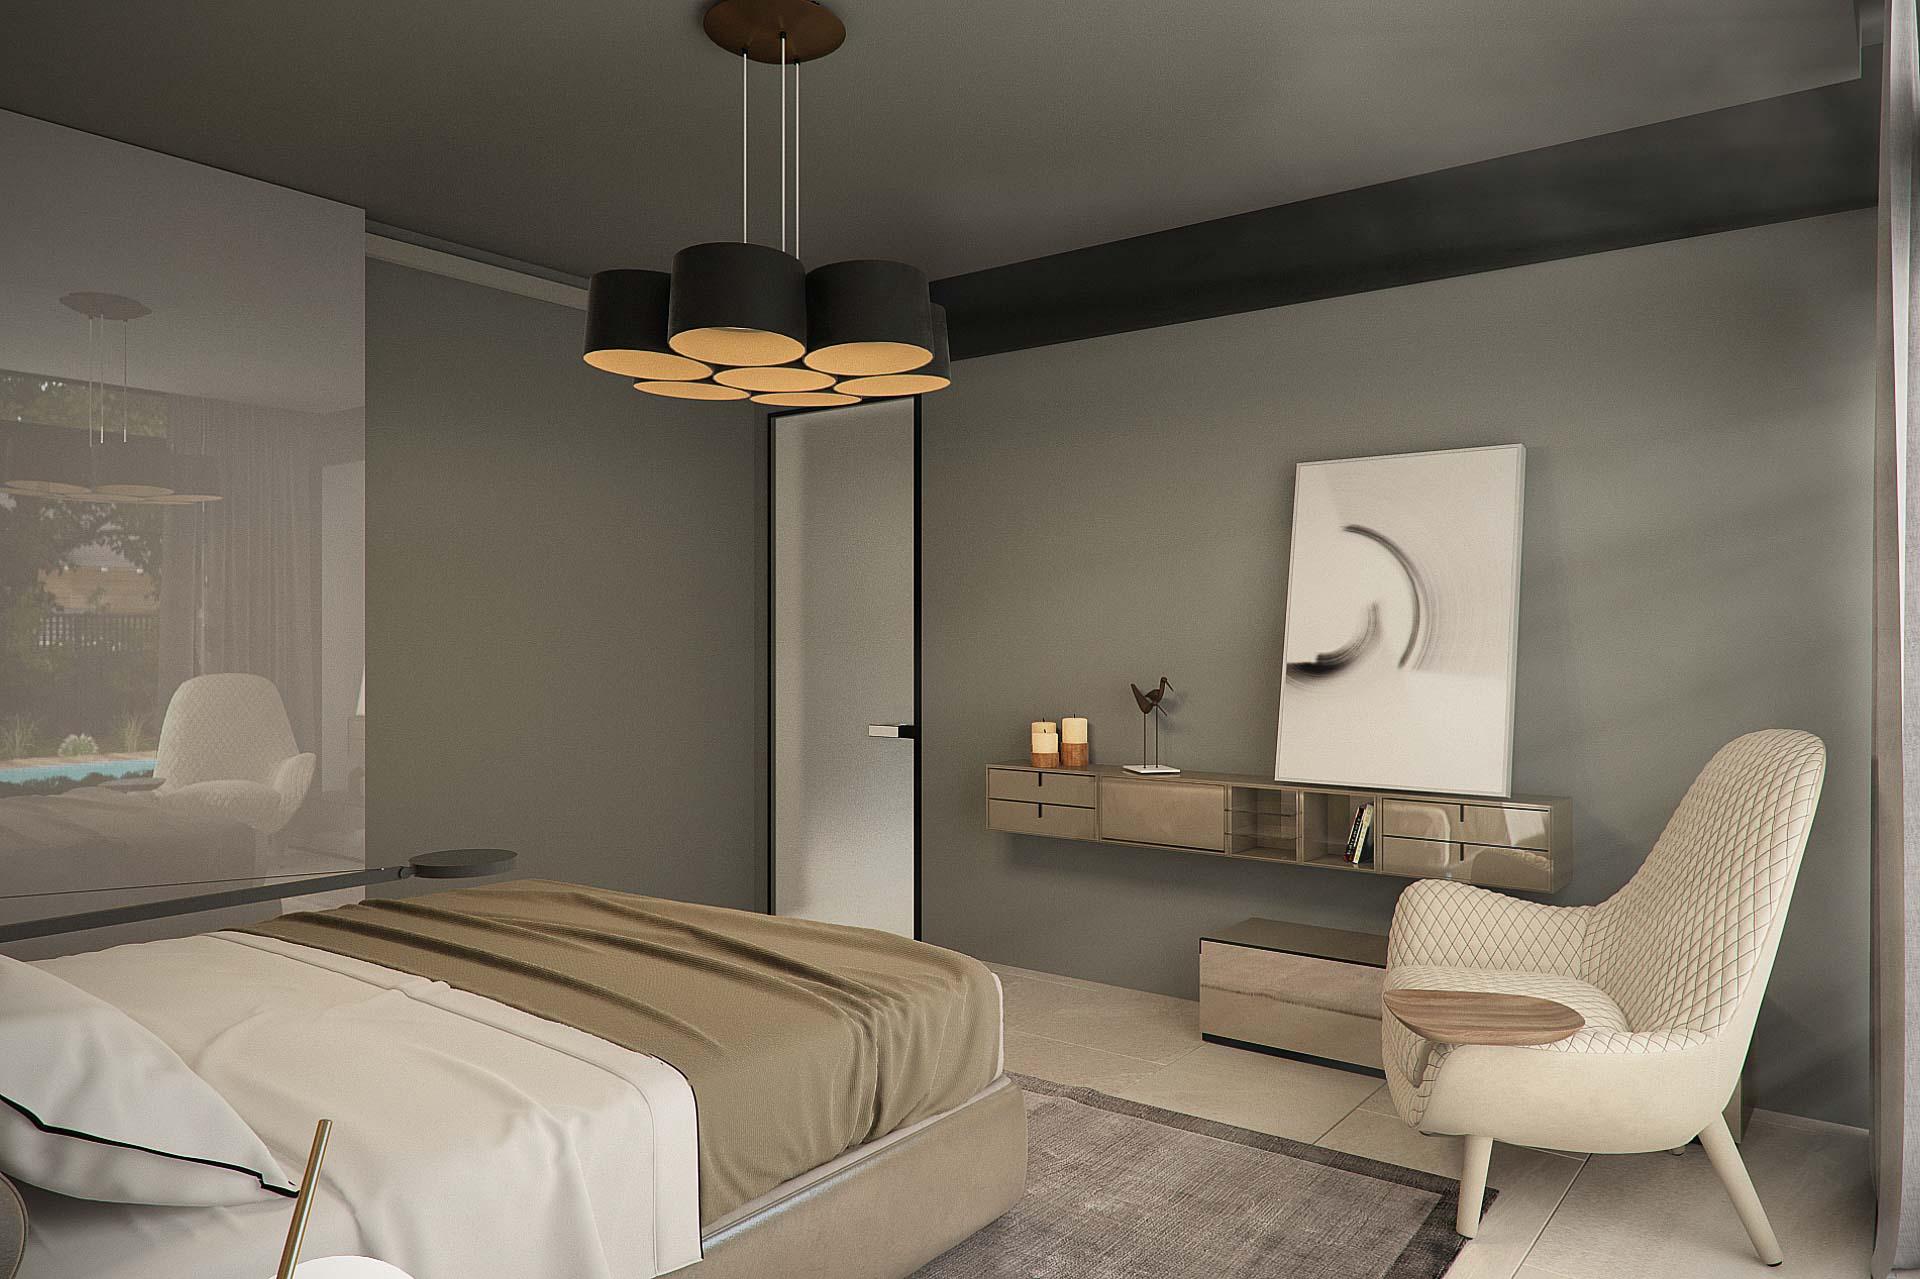 Master bedroom interior design by lera bykova view 2